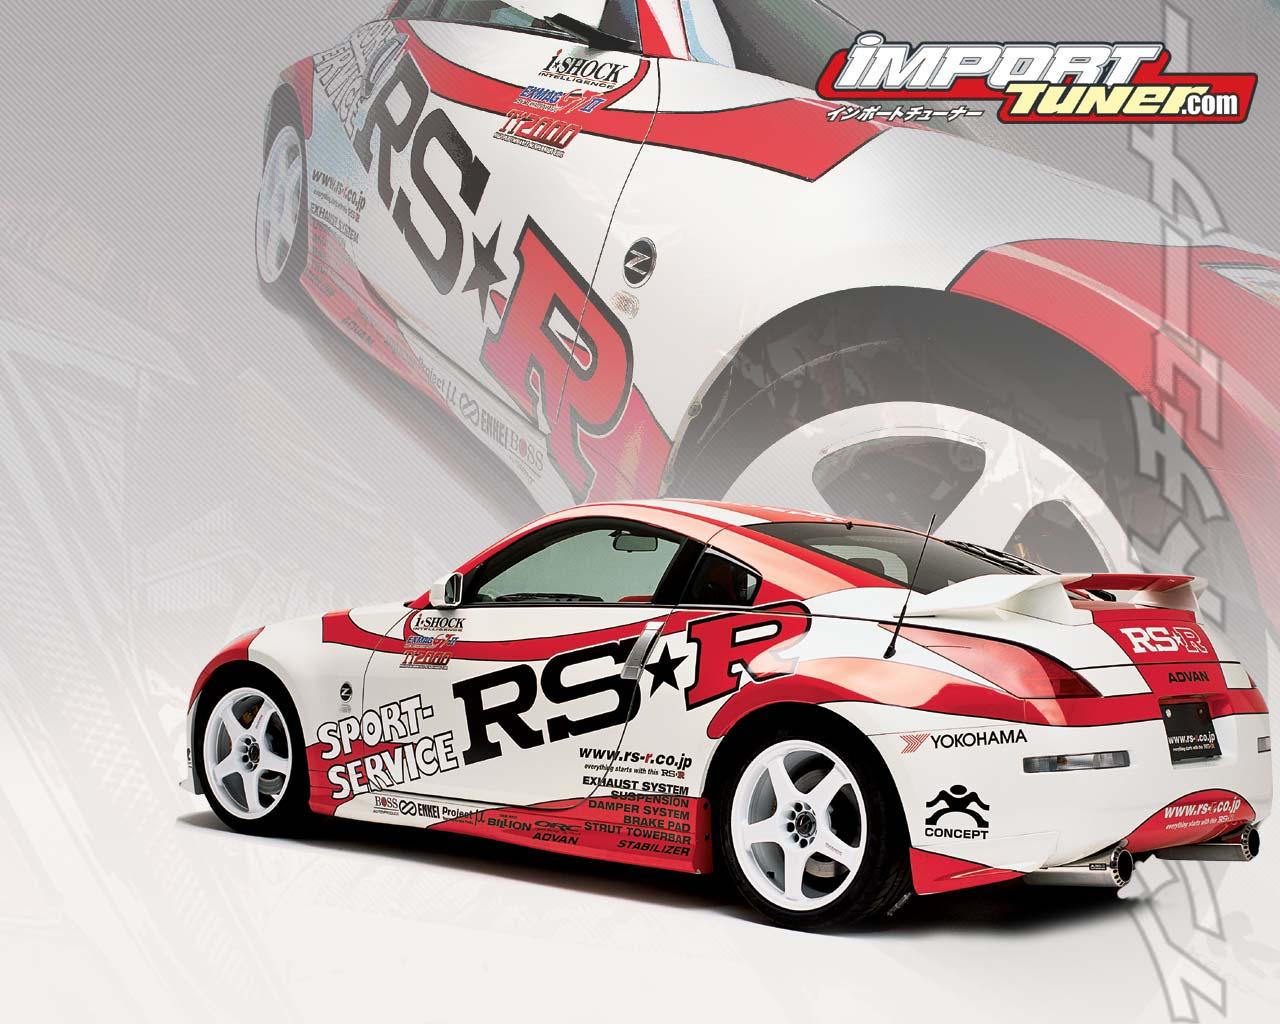 http://3.bp.blogspot.com/-PNaUR4S0d-s/T00euUr1v5I/AAAAAAAAICM/p58r20a3pJQ/s1600/Nissan_350Z,_Tuning_Car,_Import_Tuner_2003.jpg